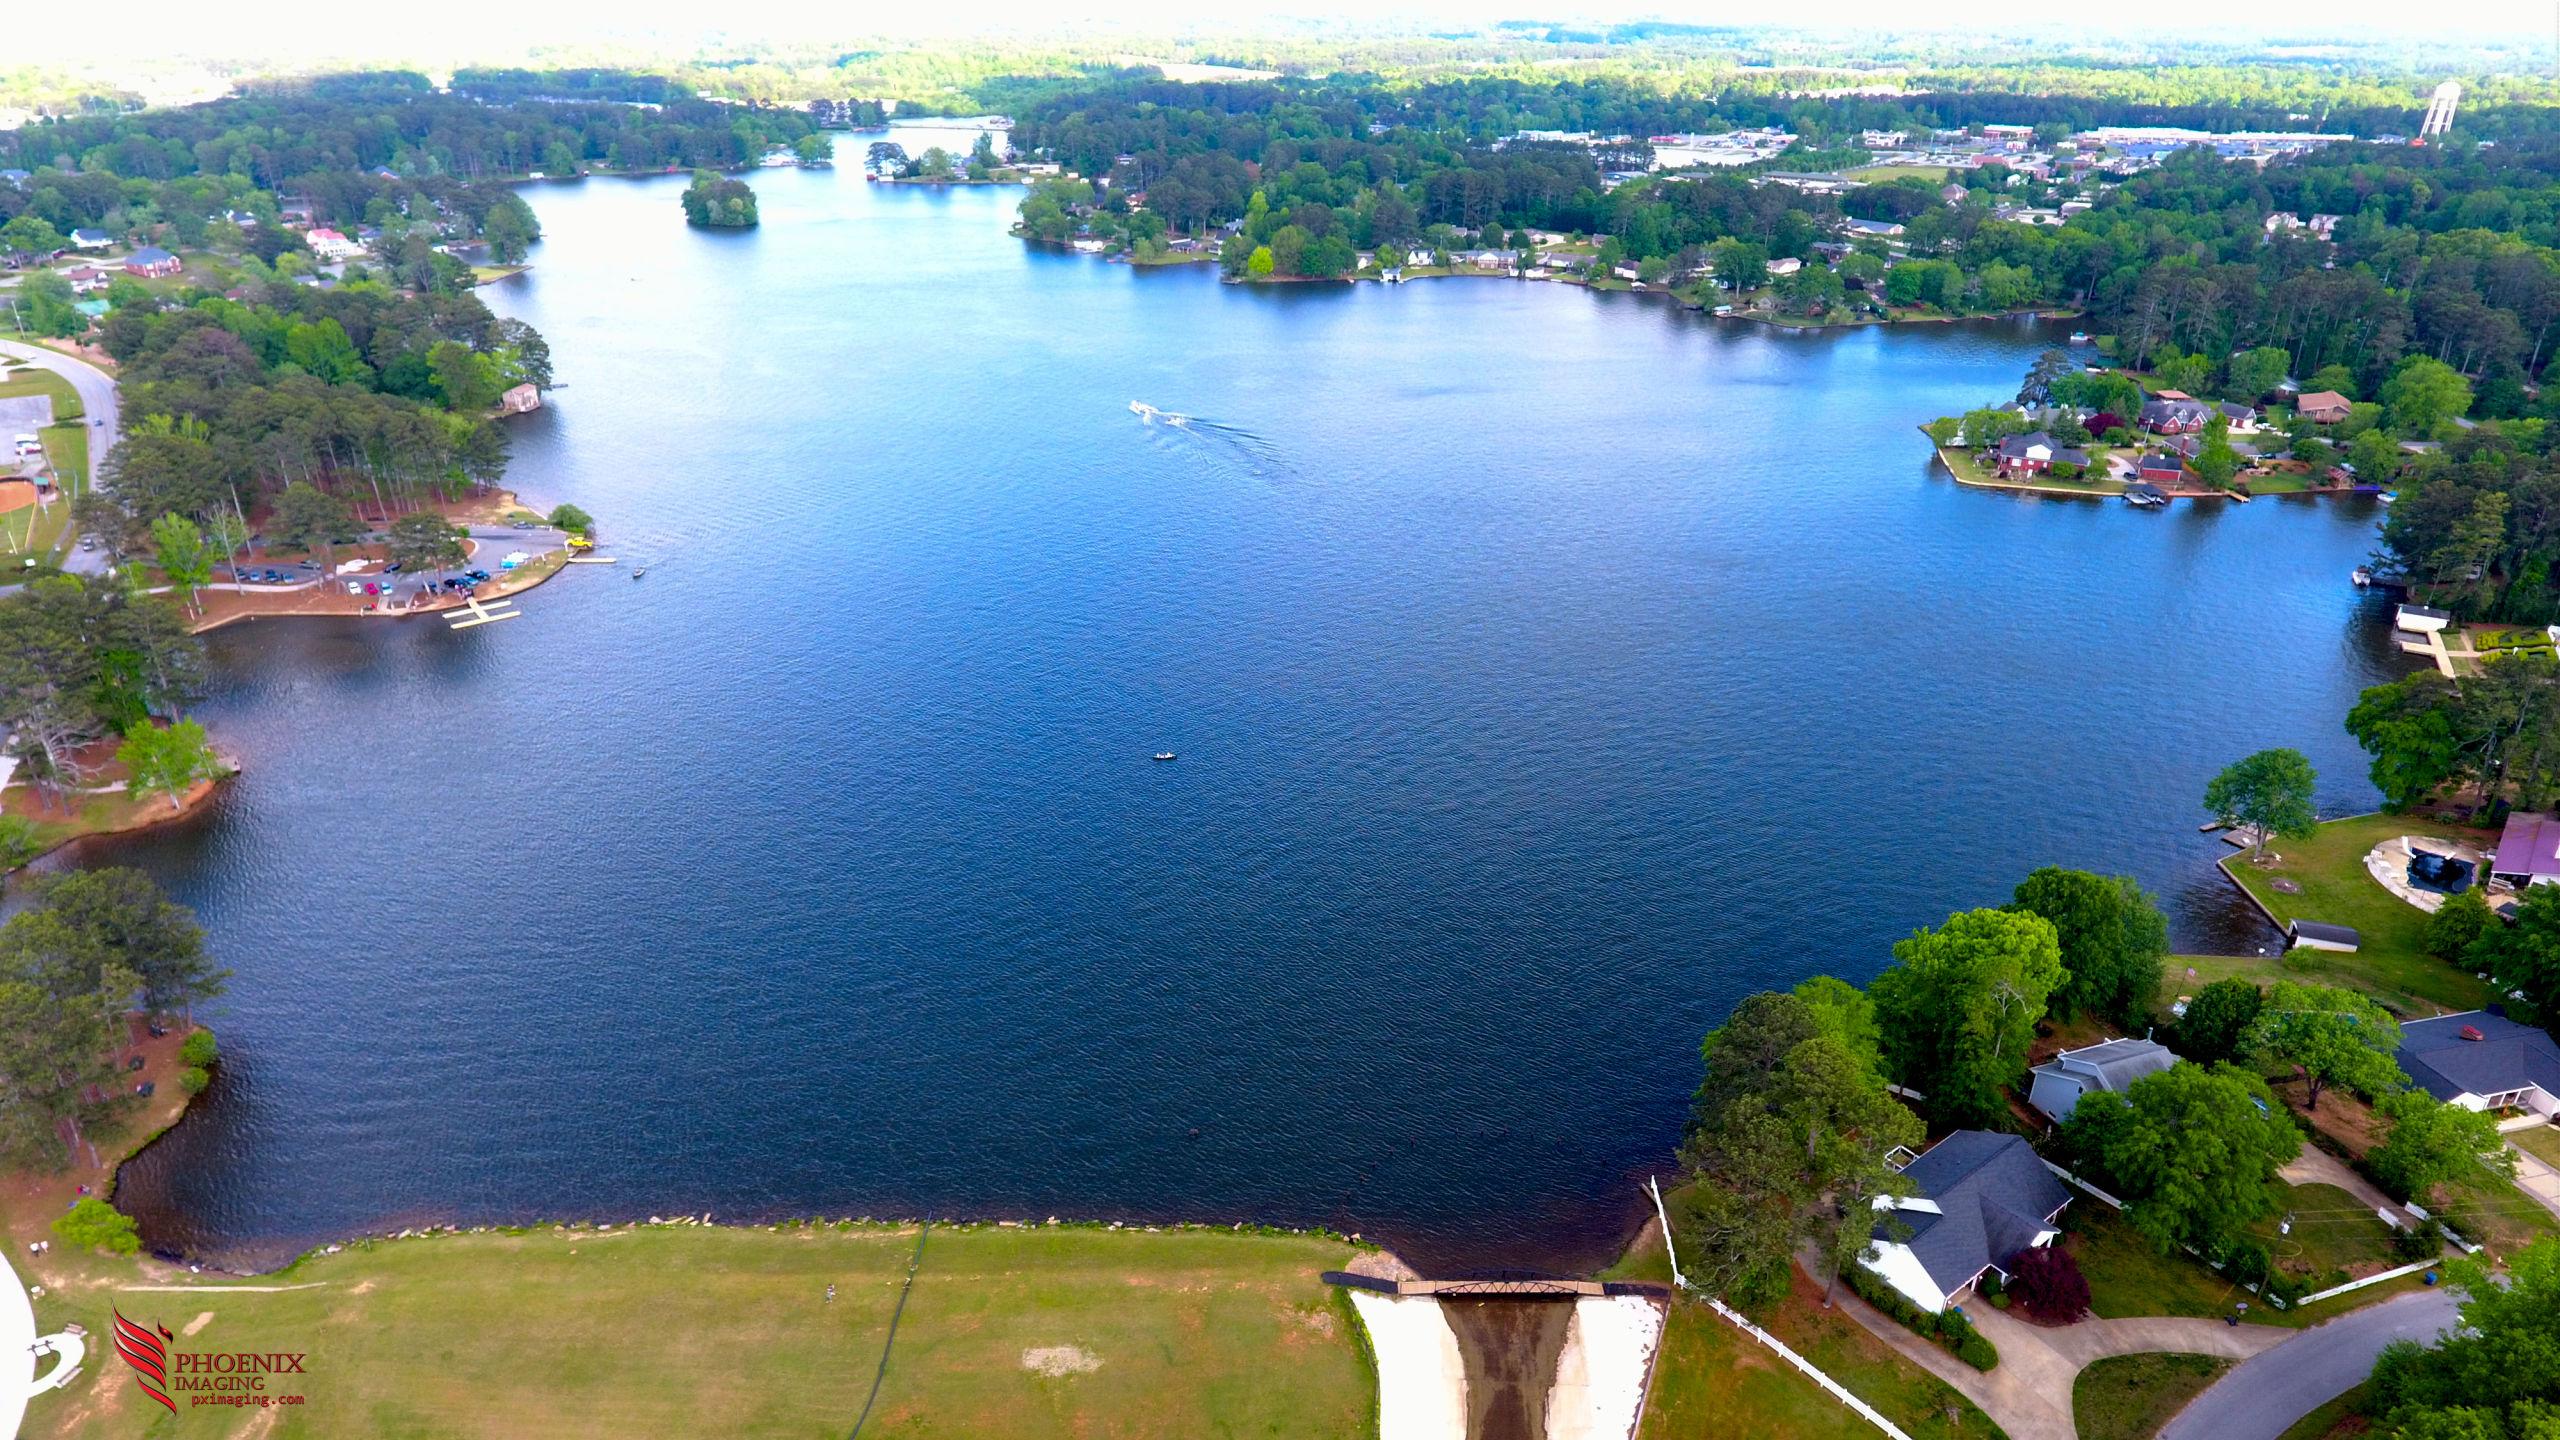 The views at Lake Carroll in Carrollton, Georgia are beautiful.